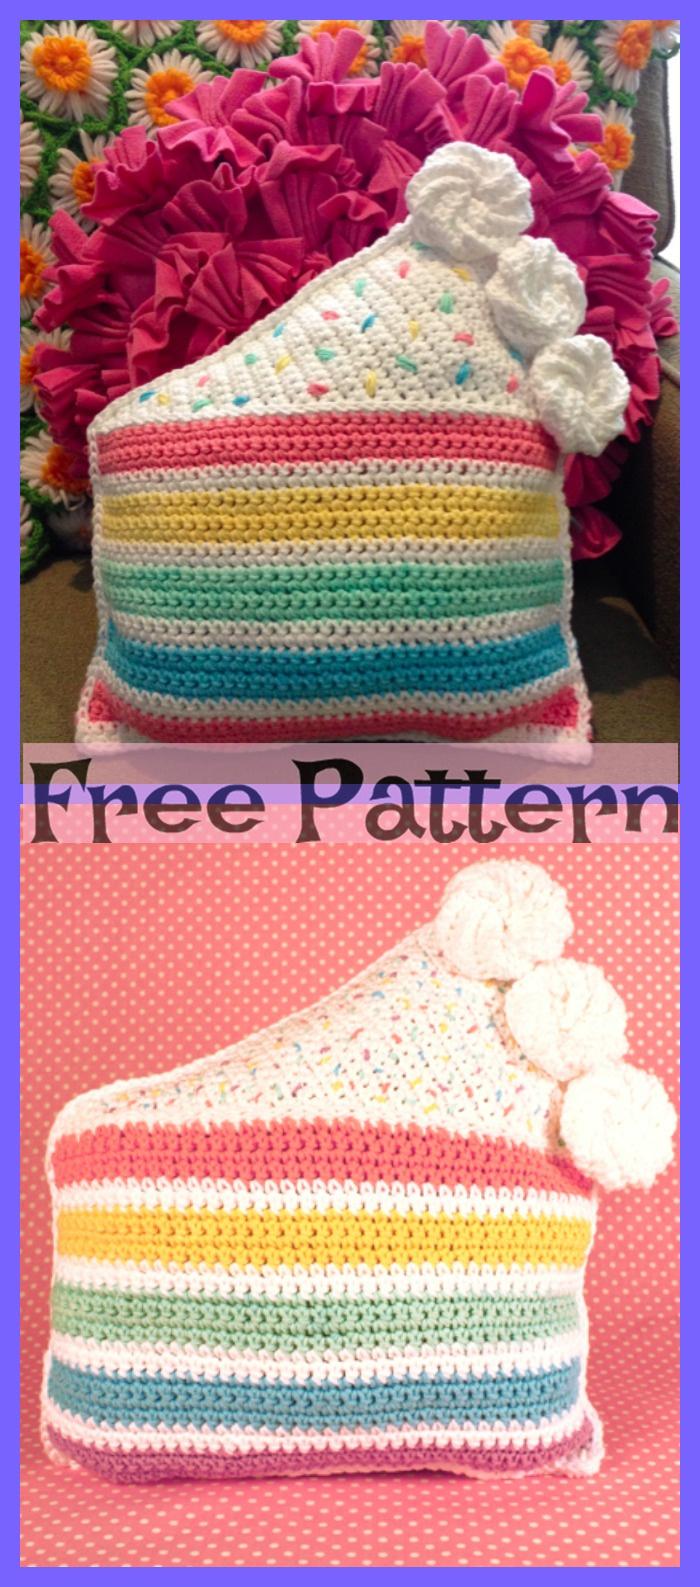 diy4ever- Crochet Rainbow Pillows - Free Patterns